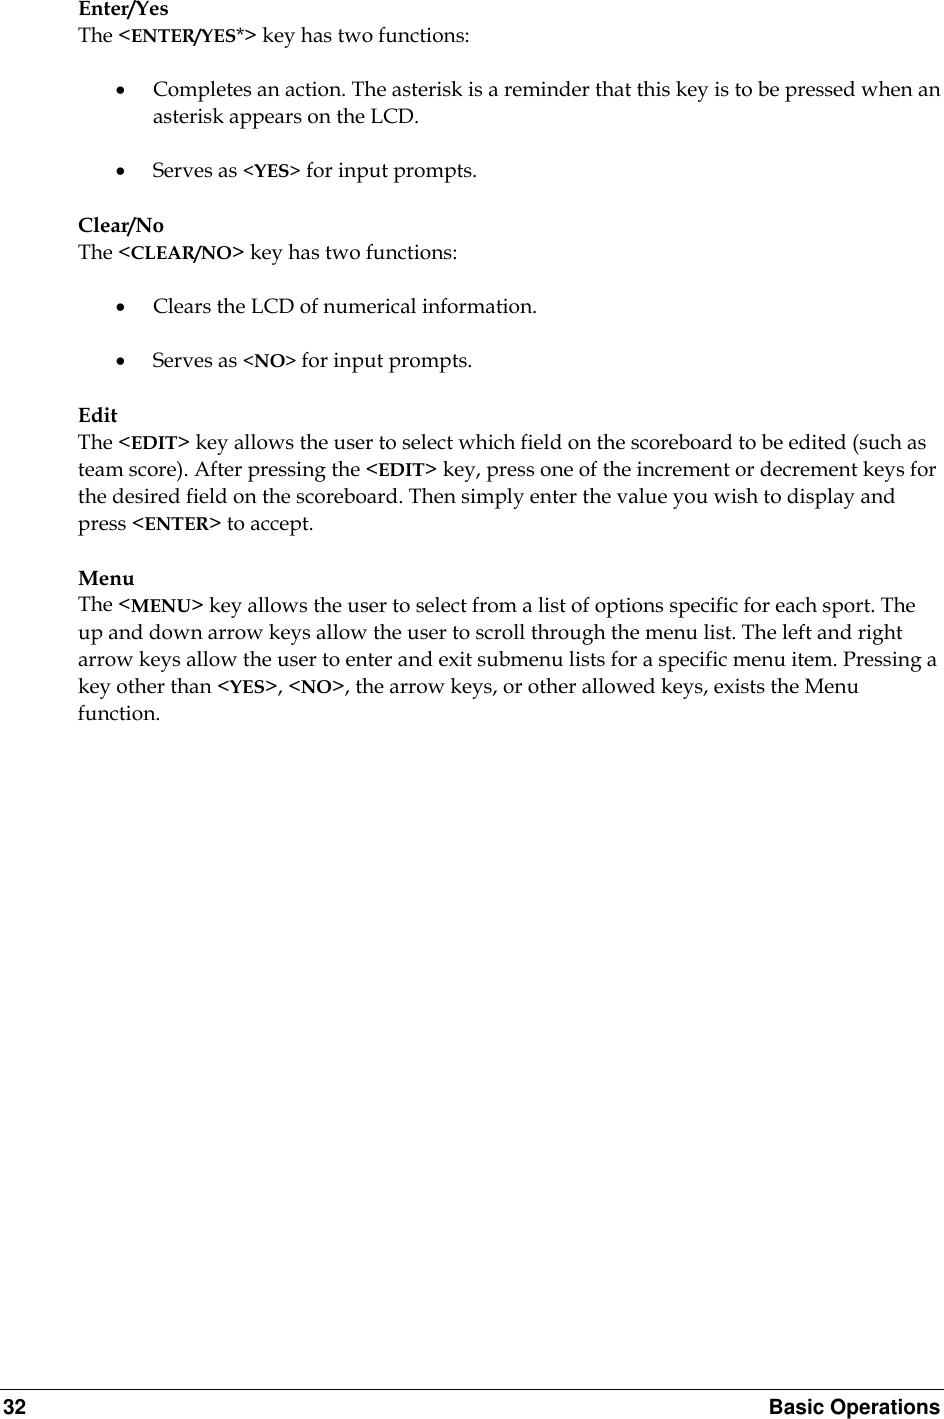 Daktronics All Sport 5000 Users Manual ED